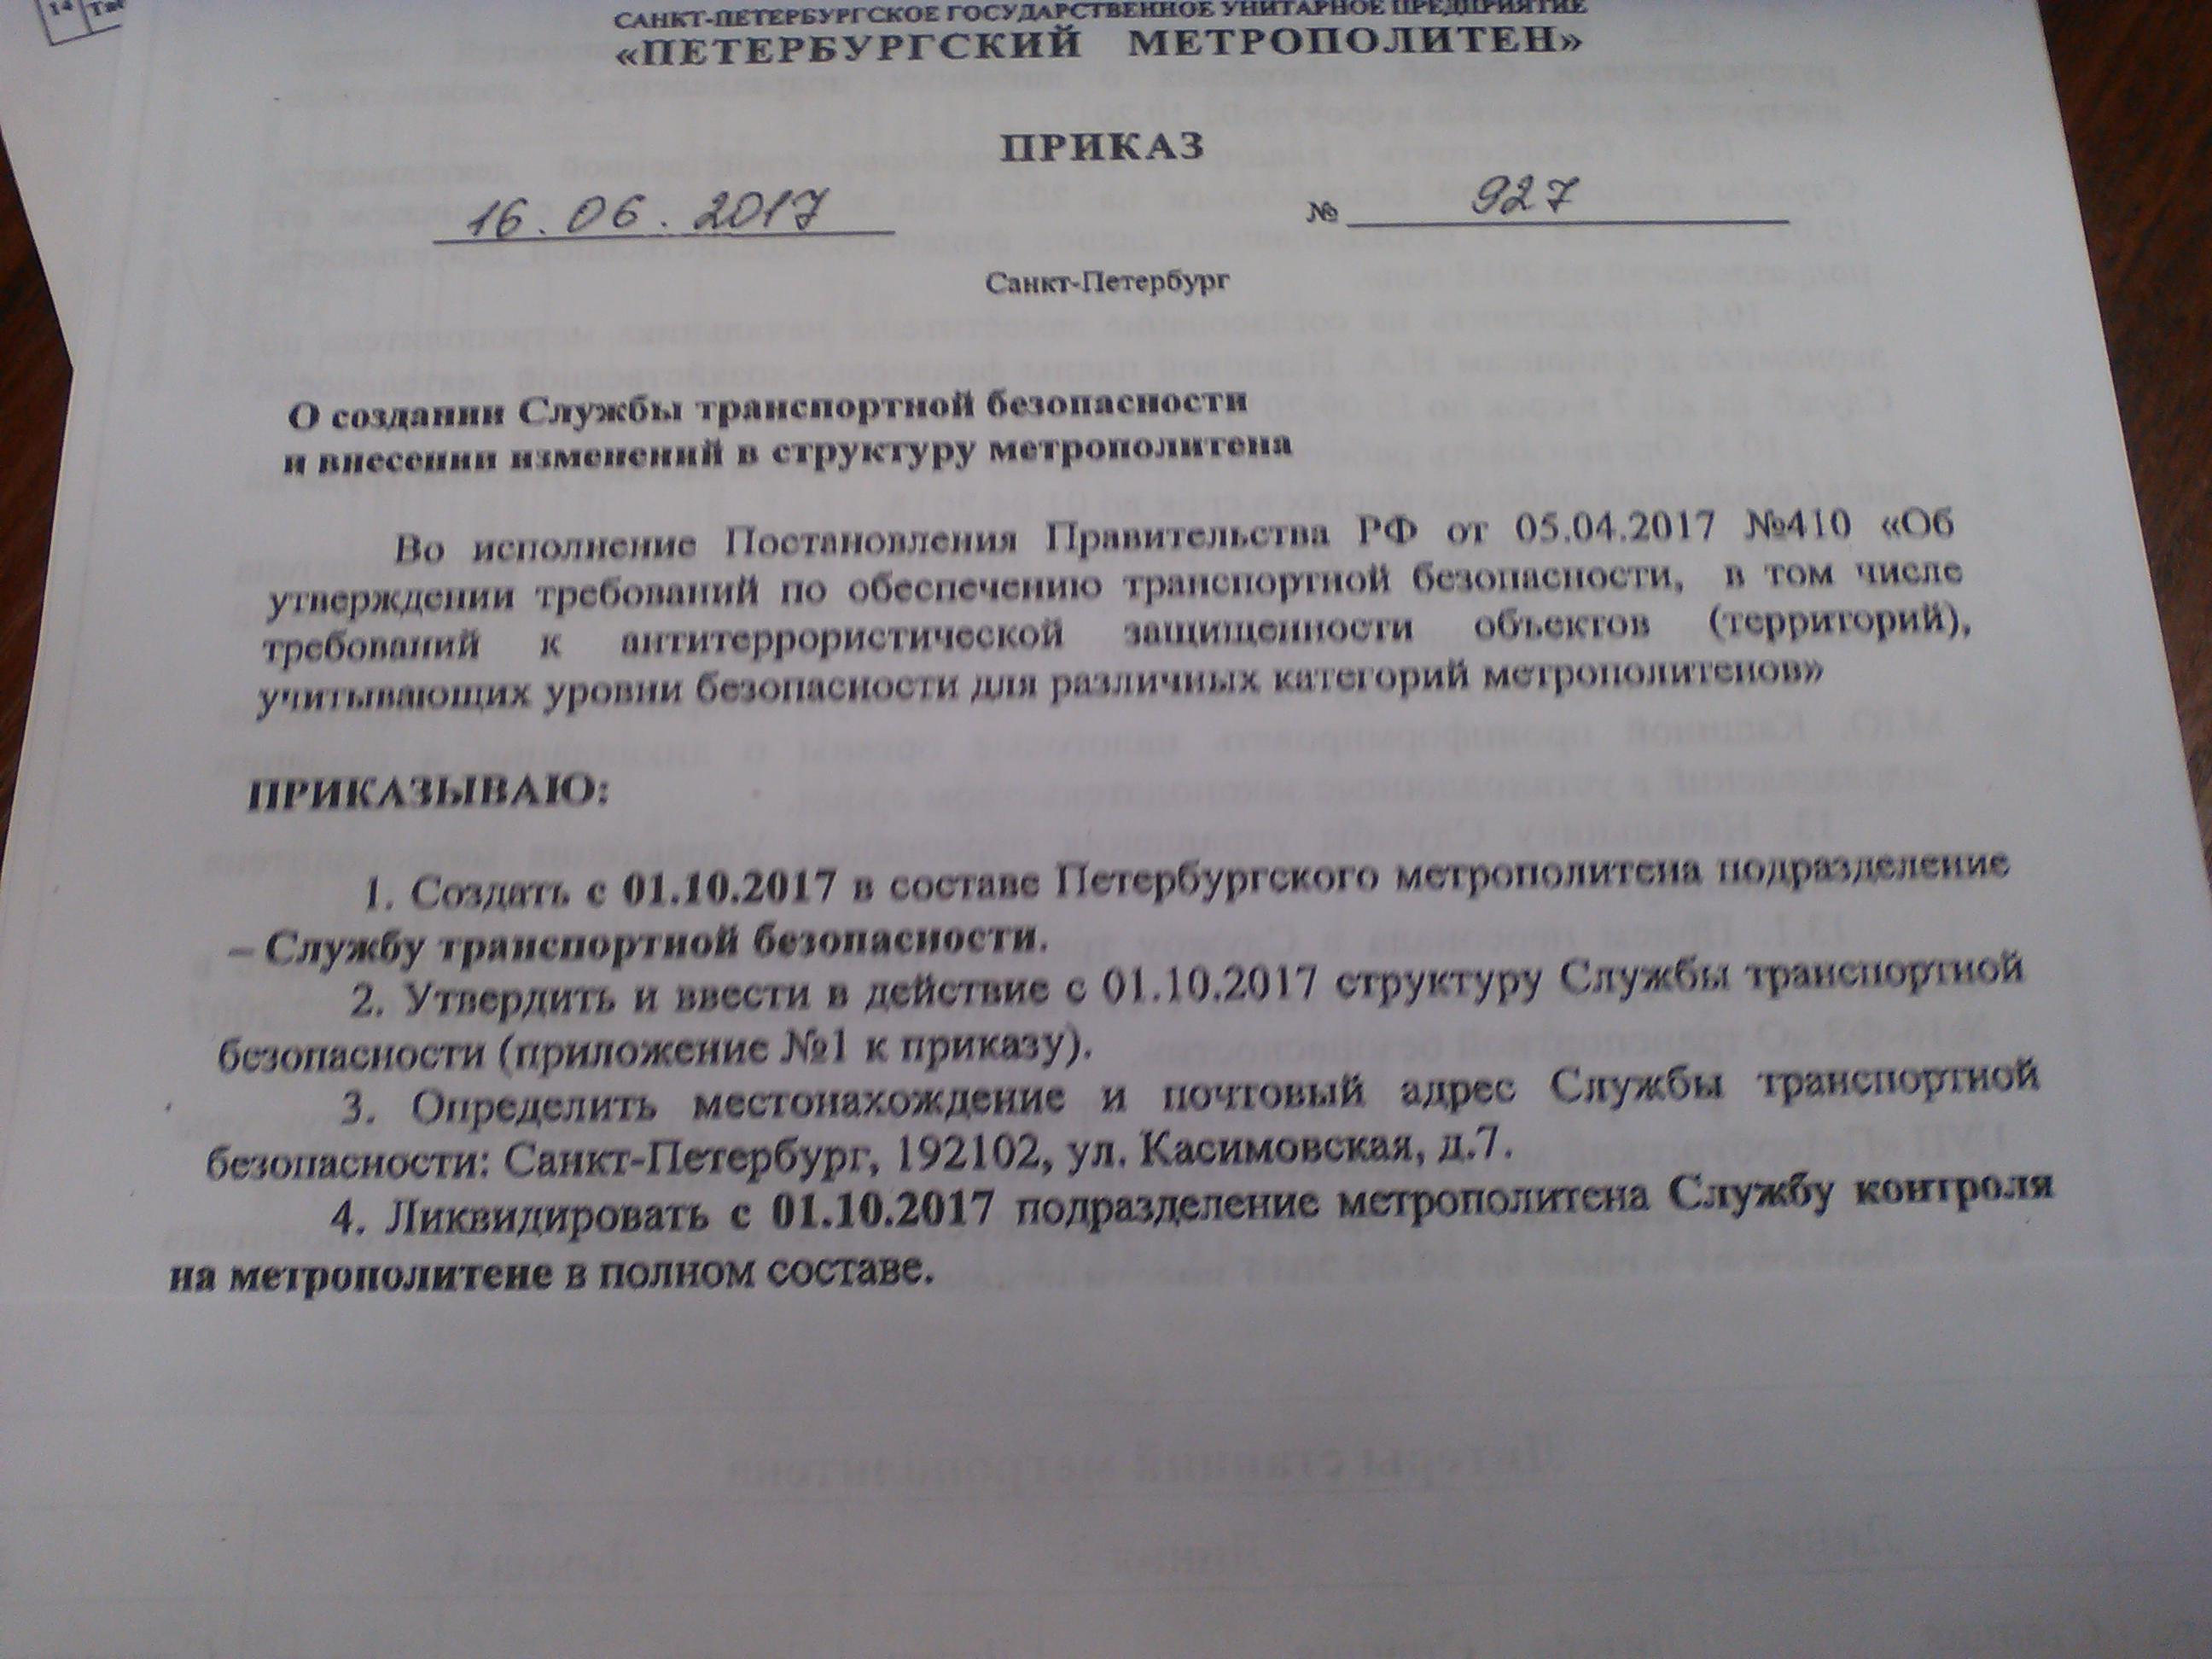 Приказ о ликвидации СКМ. Источник: https://subwaytalks.ru/download/file.php?id=39505&sid=70a91616011929d0bbc6505ad1f4f539&mode=view